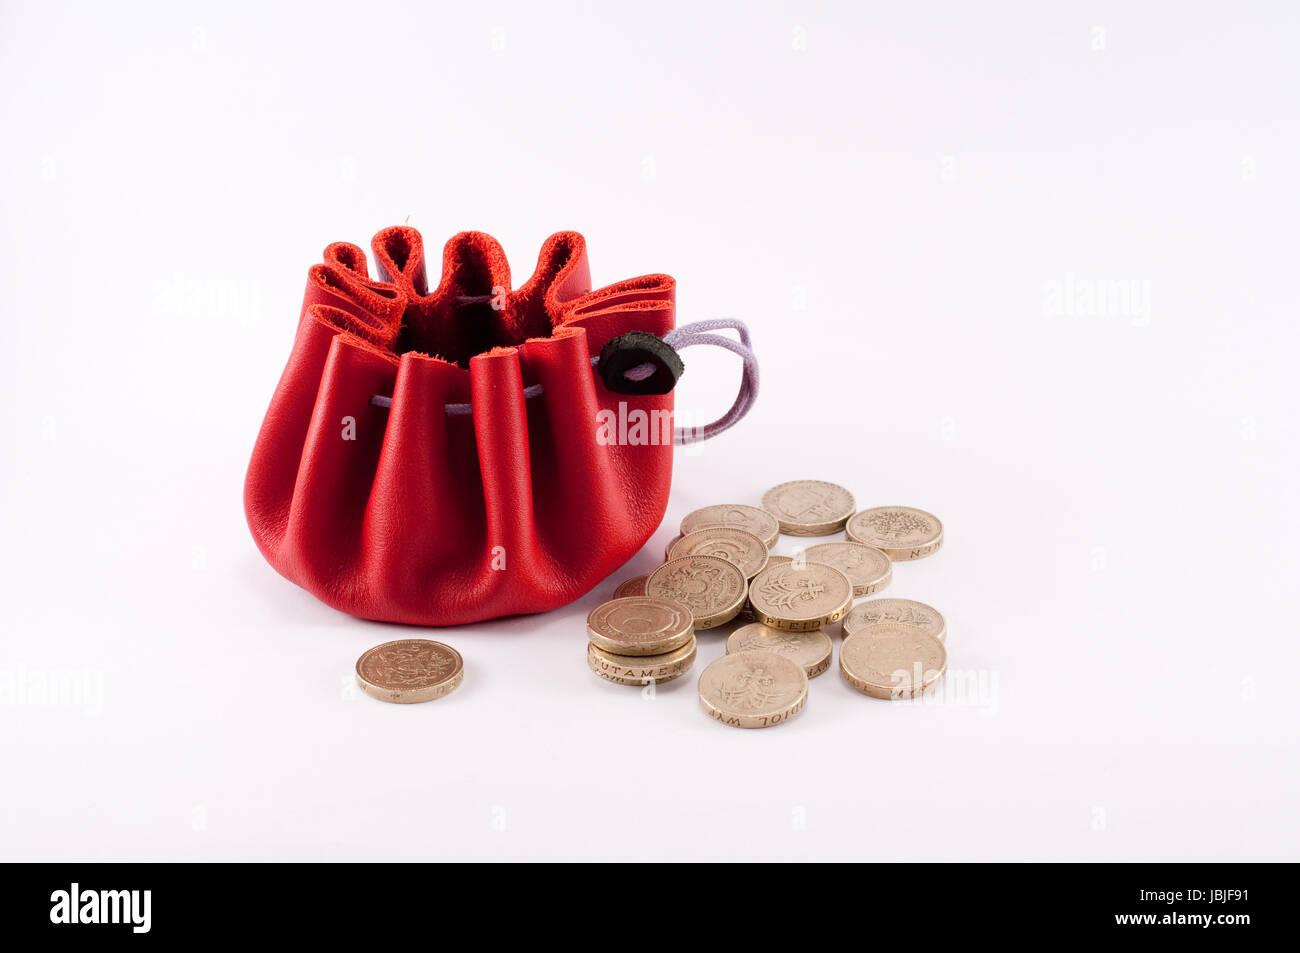 money in cash money - Stock Image